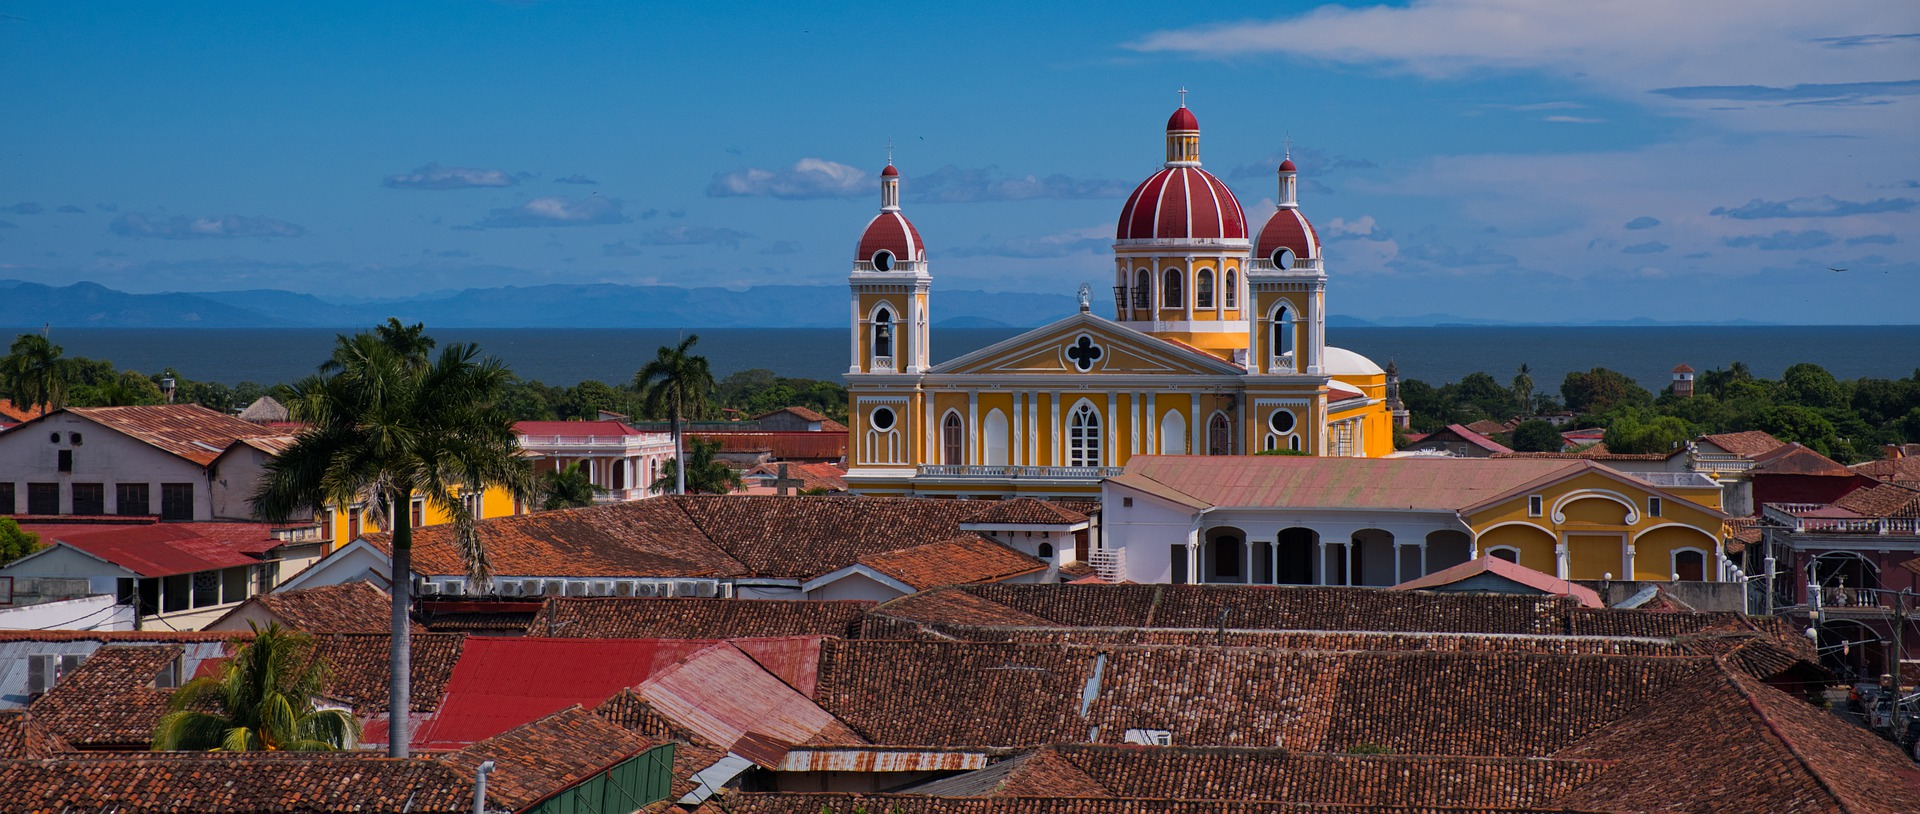 Private detectives and investigators in Nicaragua